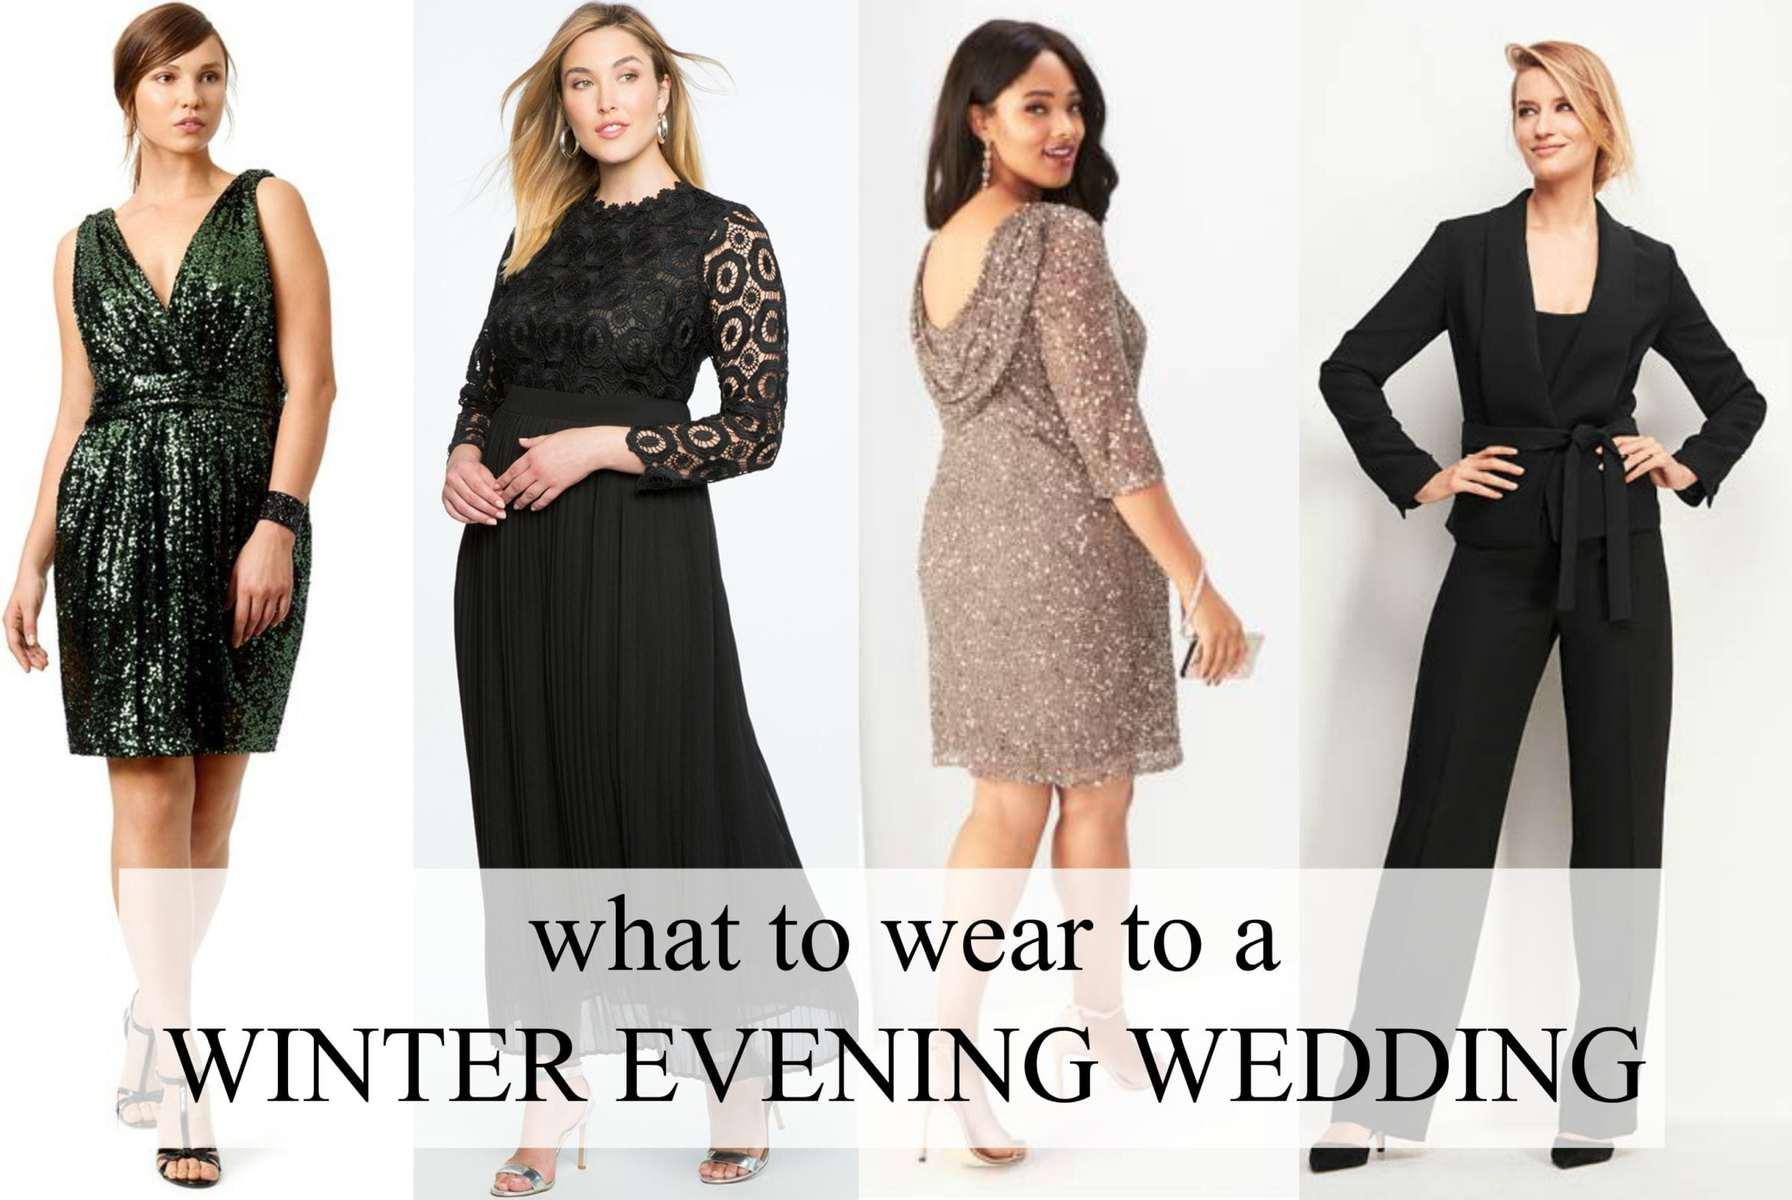 What To Wear To A Winter Evening Wedding Wardrobe Oxygen